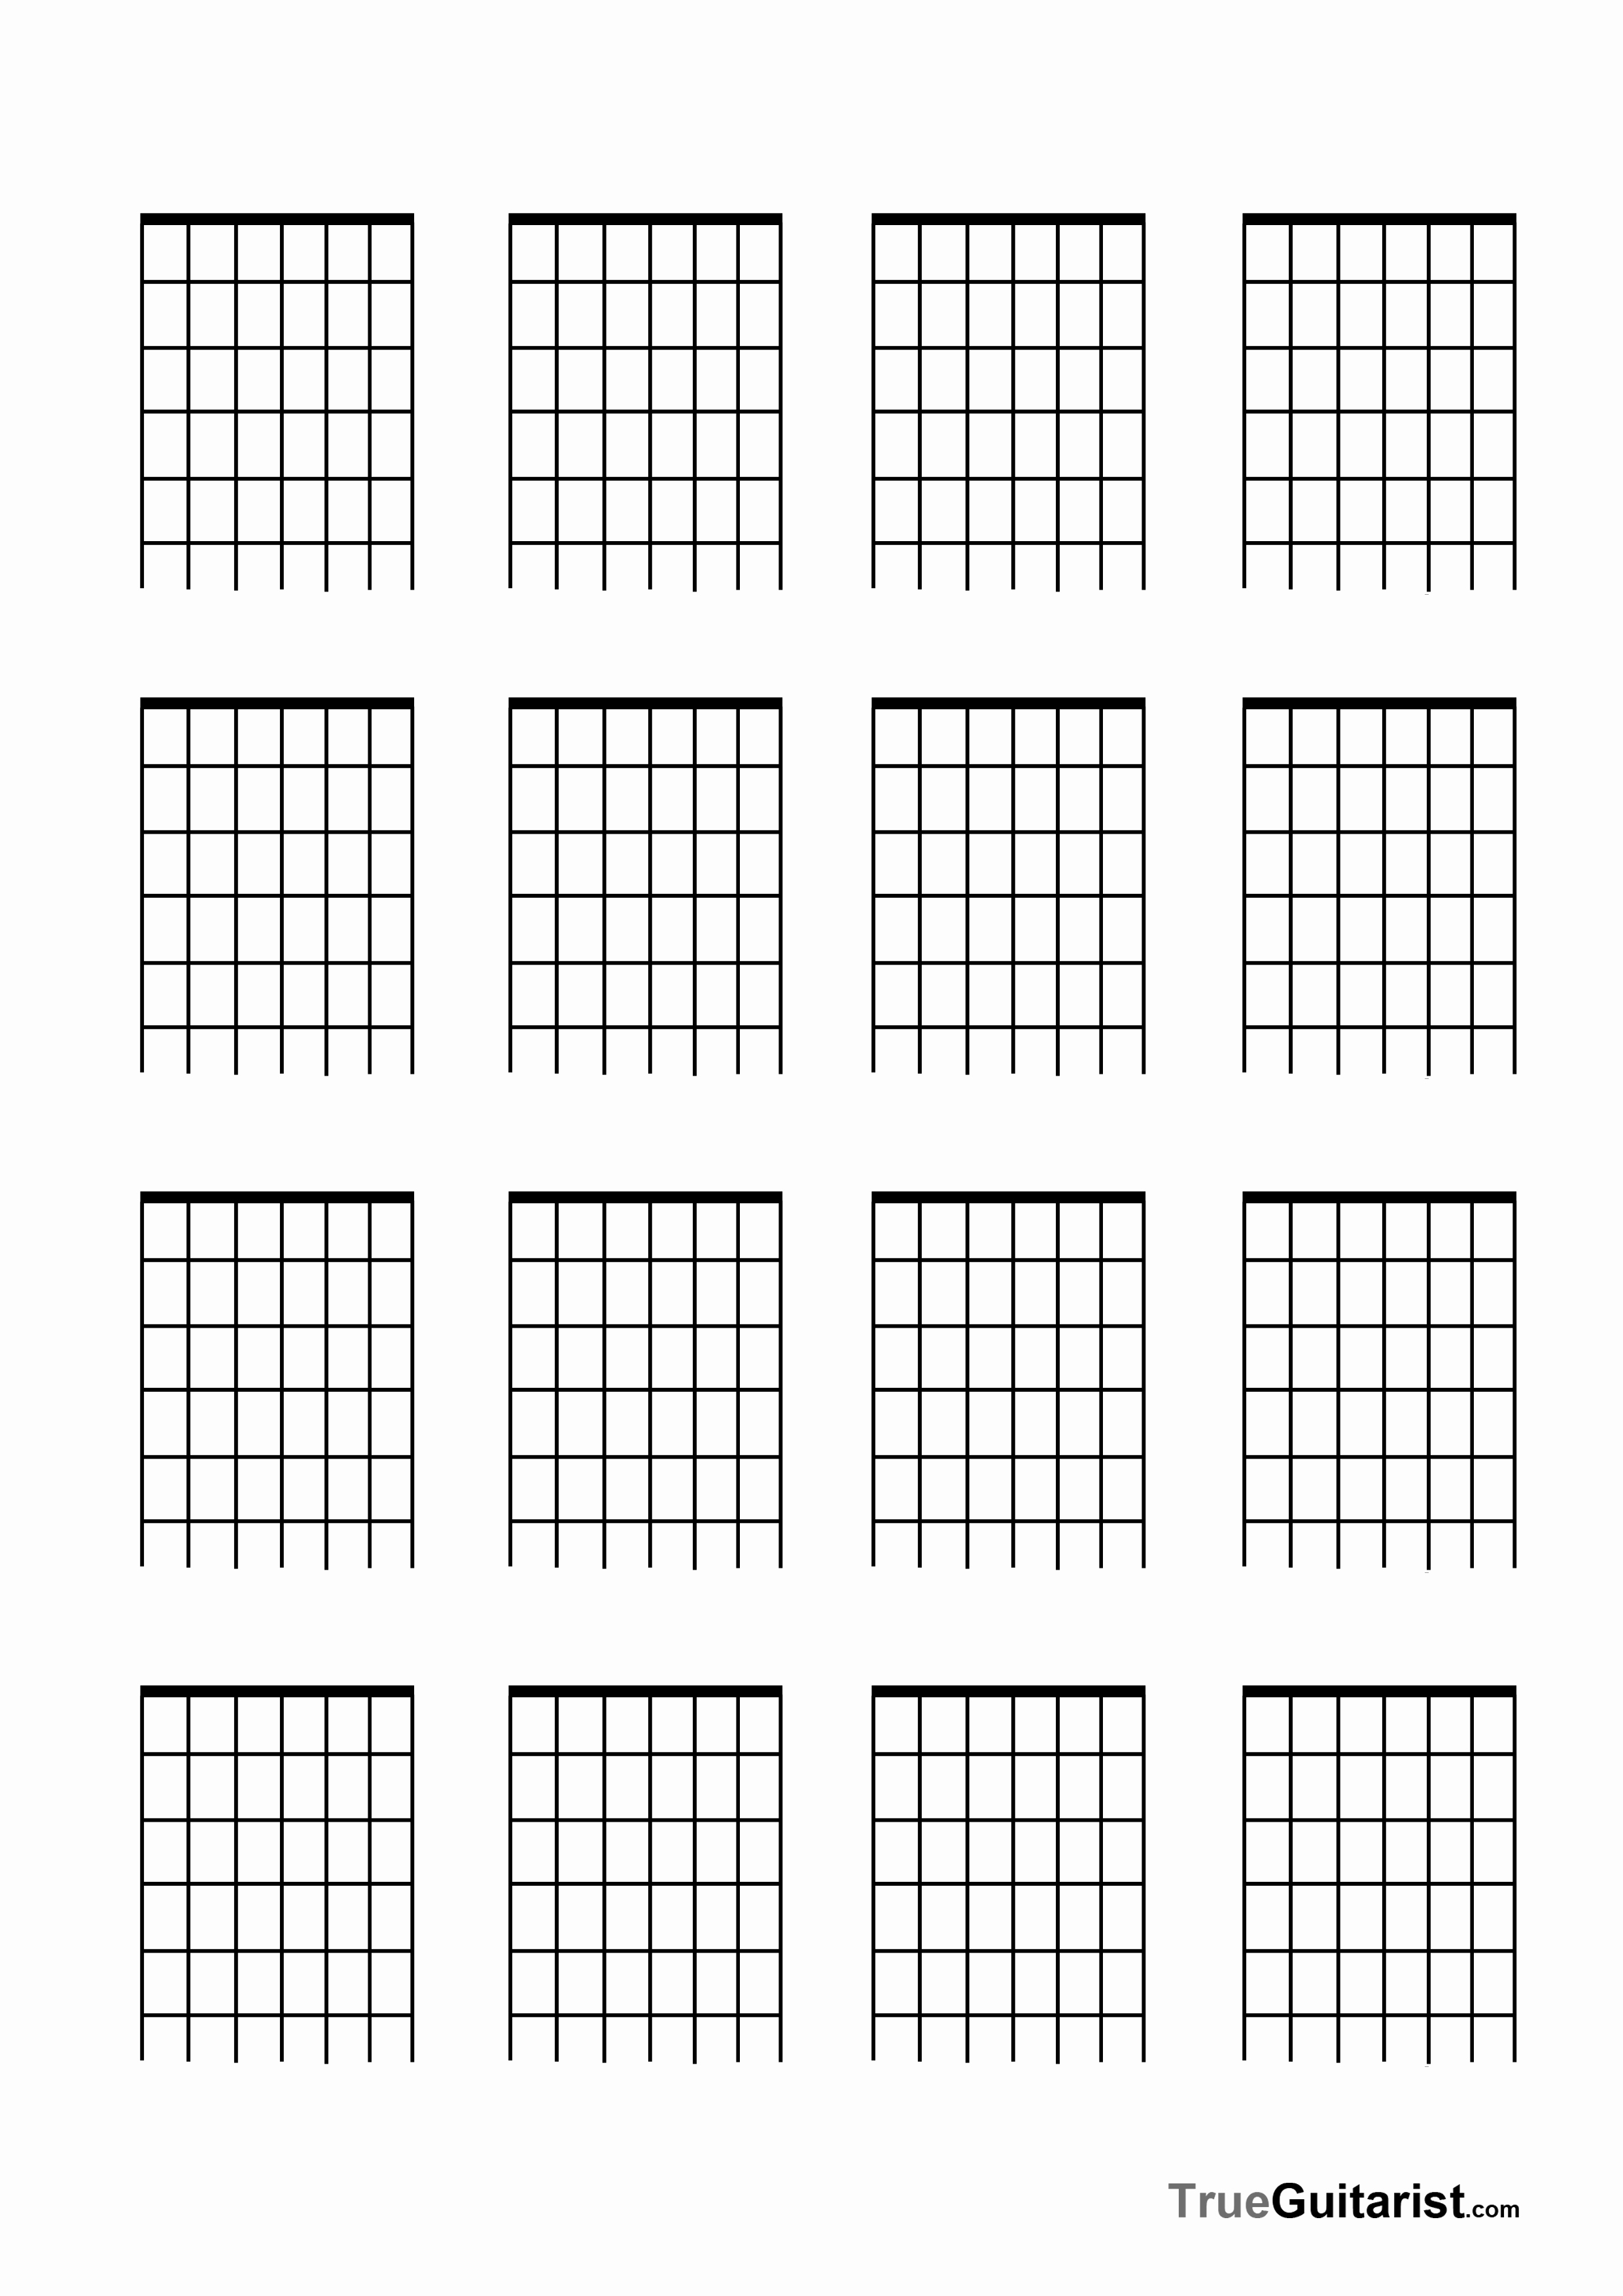 Blank Guitar Tab Pdf Elegant 7 String Guitar Free Blank Templates Trueguitarist